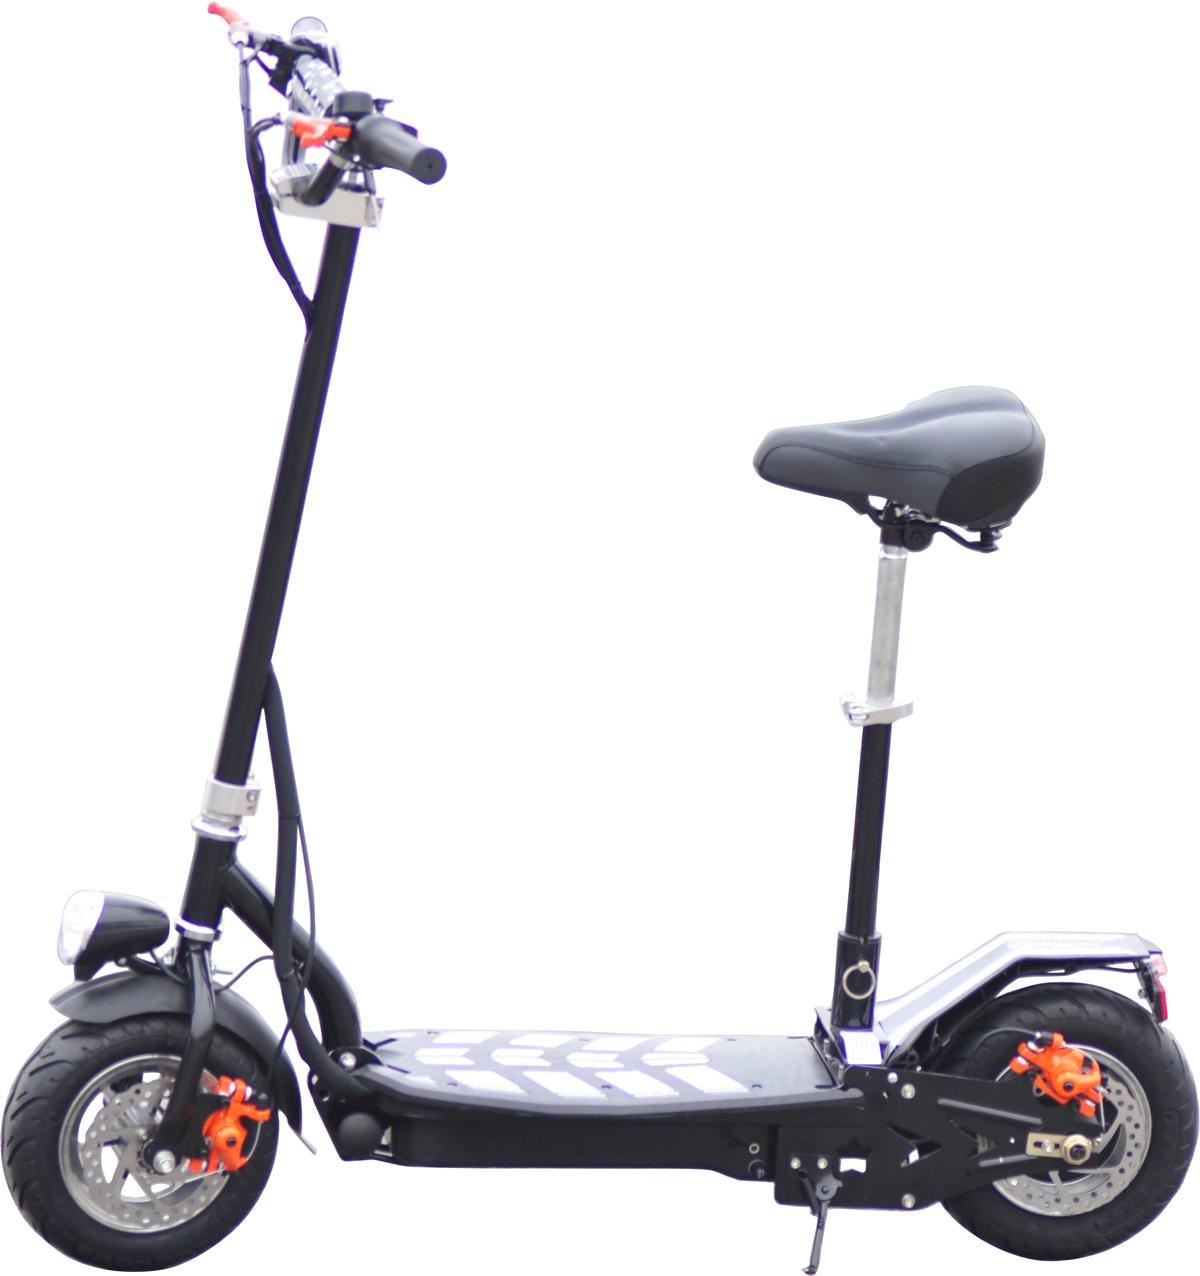 hitec htcdr500li elektro scooter max 20 km h. Black Bedroom Furniture Sets. Home Design Ideas